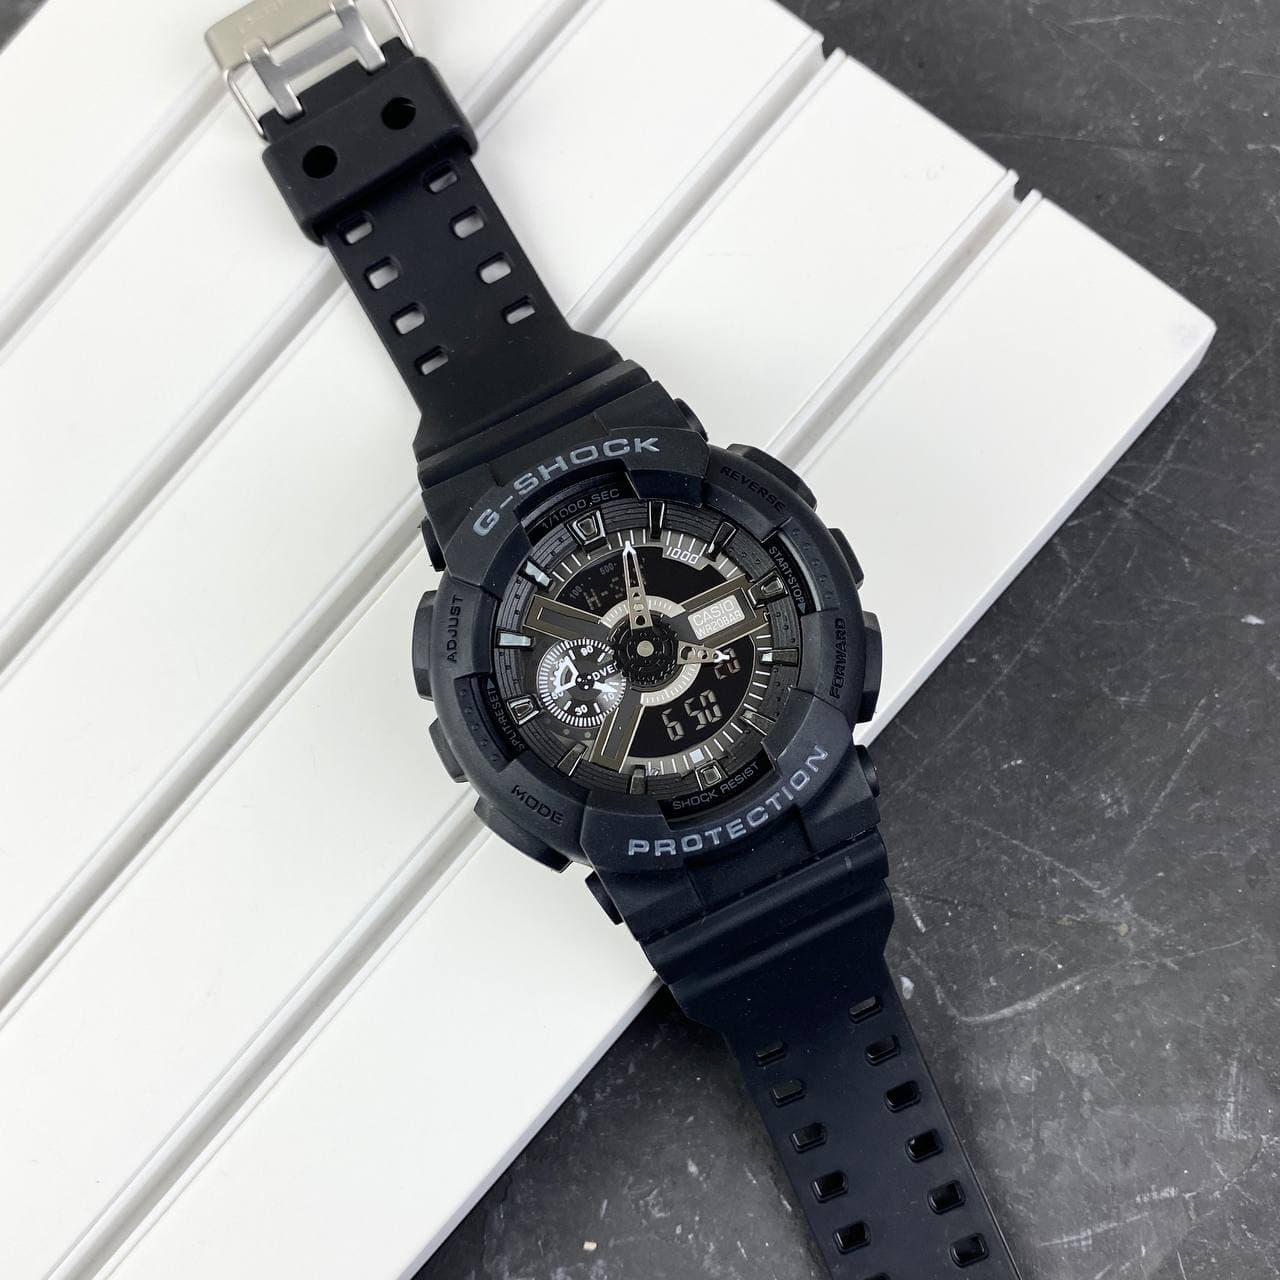 Мужские наручные часы Casio G-Shock GA-110 Black-Silver New